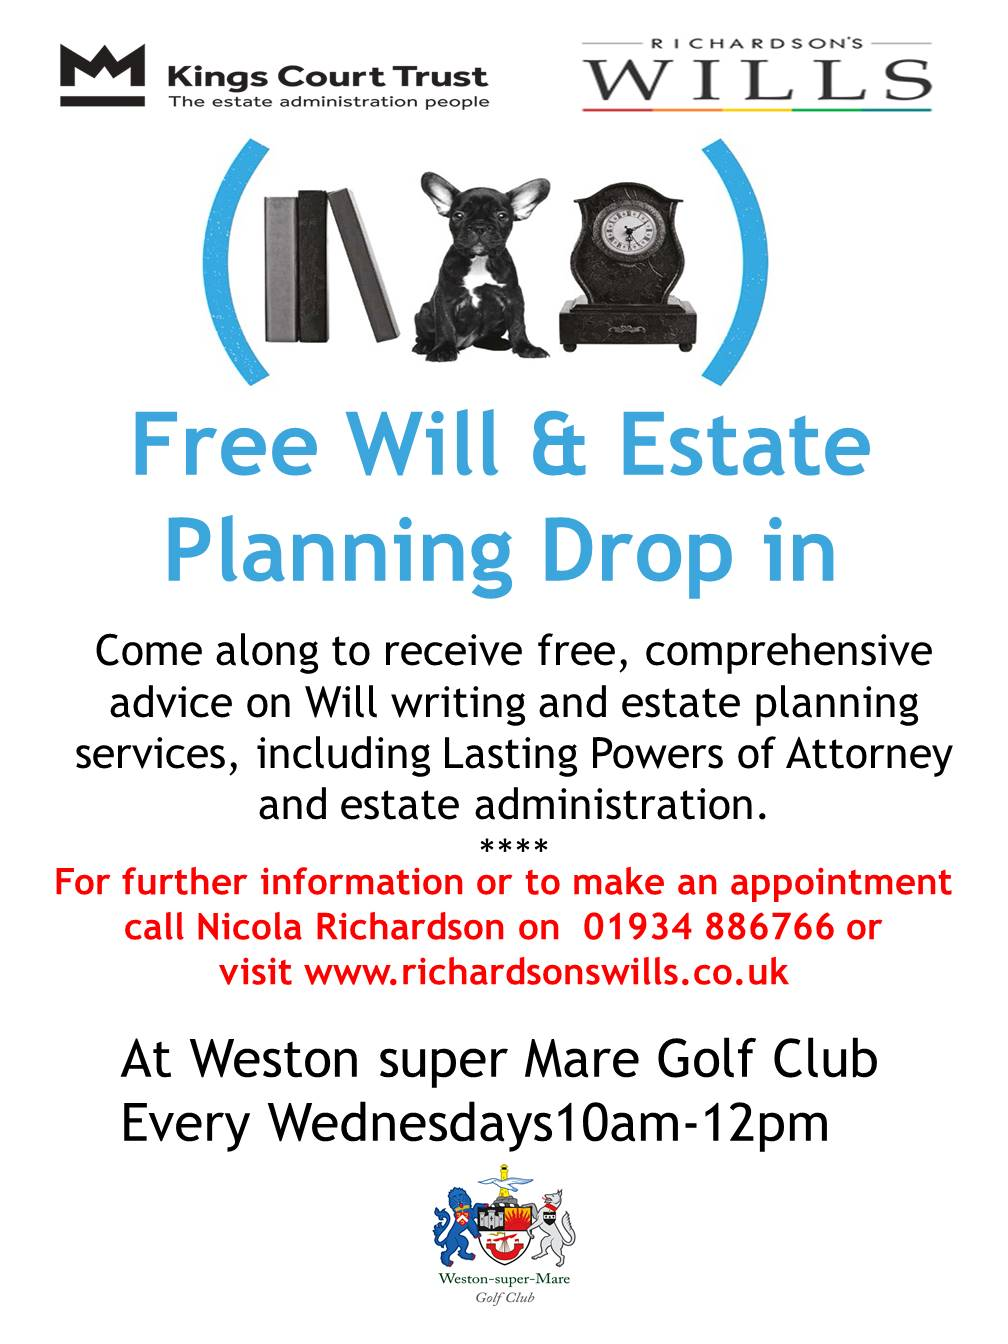 Richardsons wills  Kings Court Trust poster 1 (2)